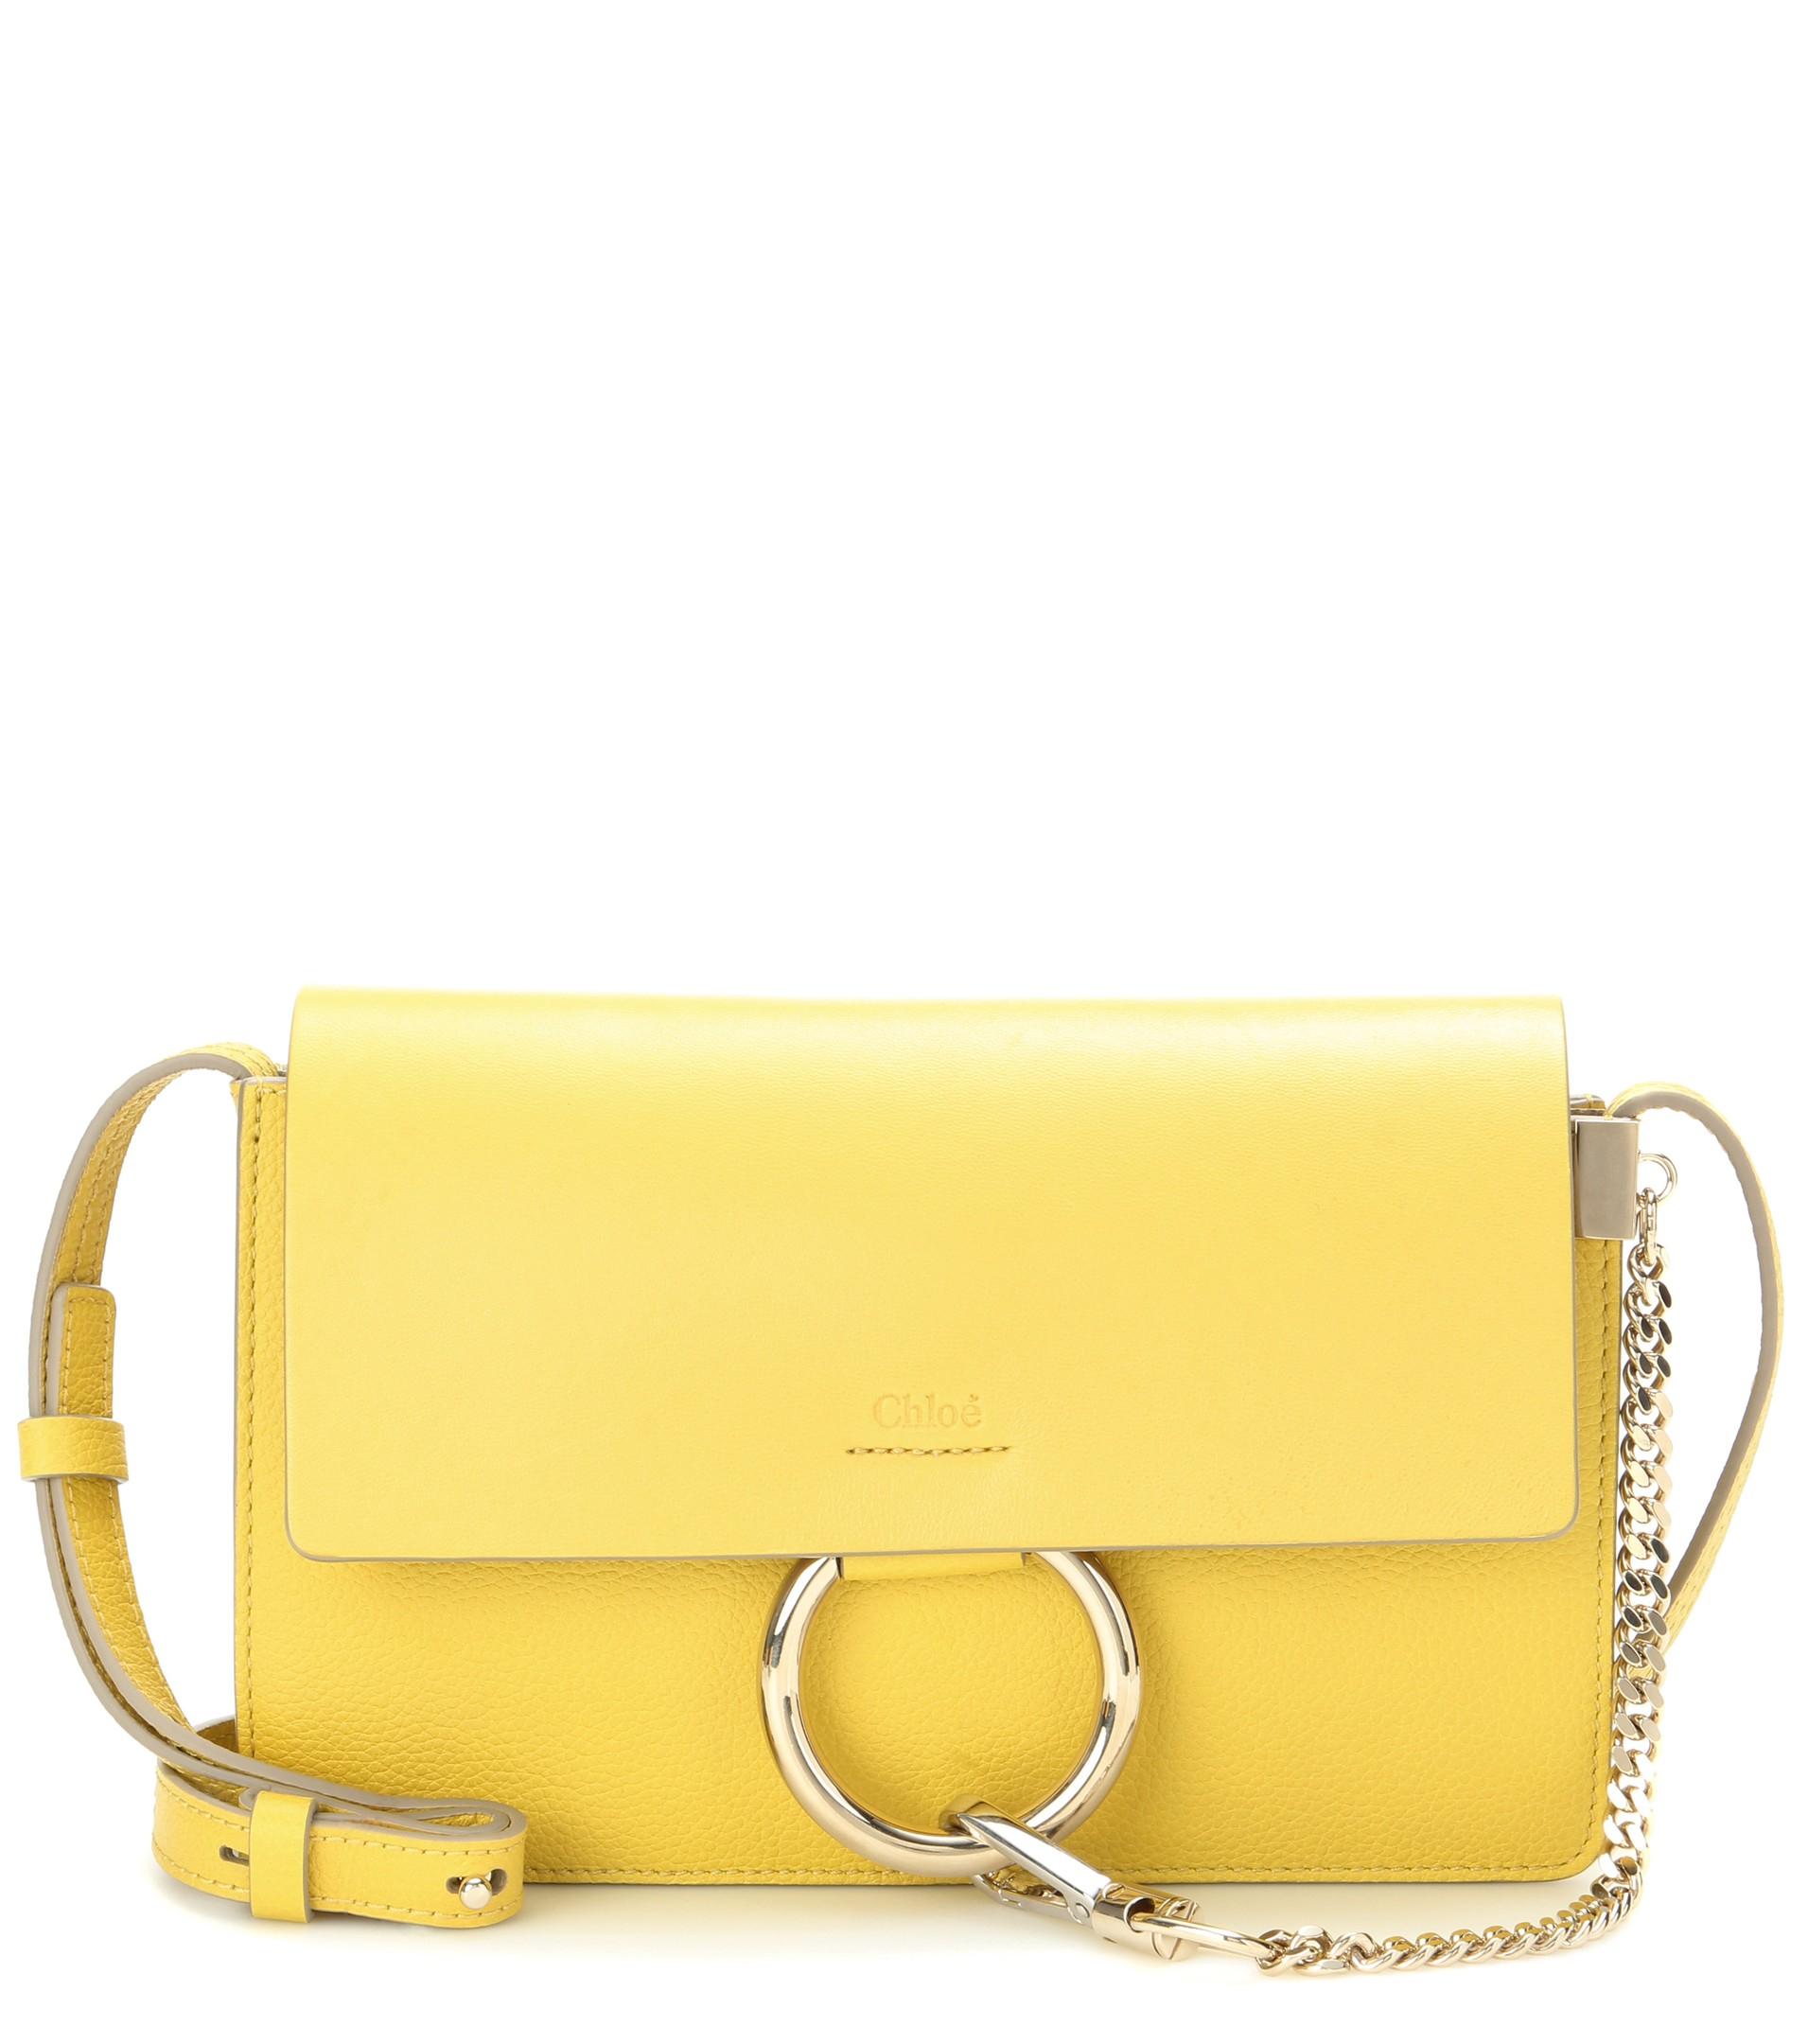 knockoff chloe handbags - Chlo�� Faye Small Leather Shoulder Bag in Yellow | Lyst